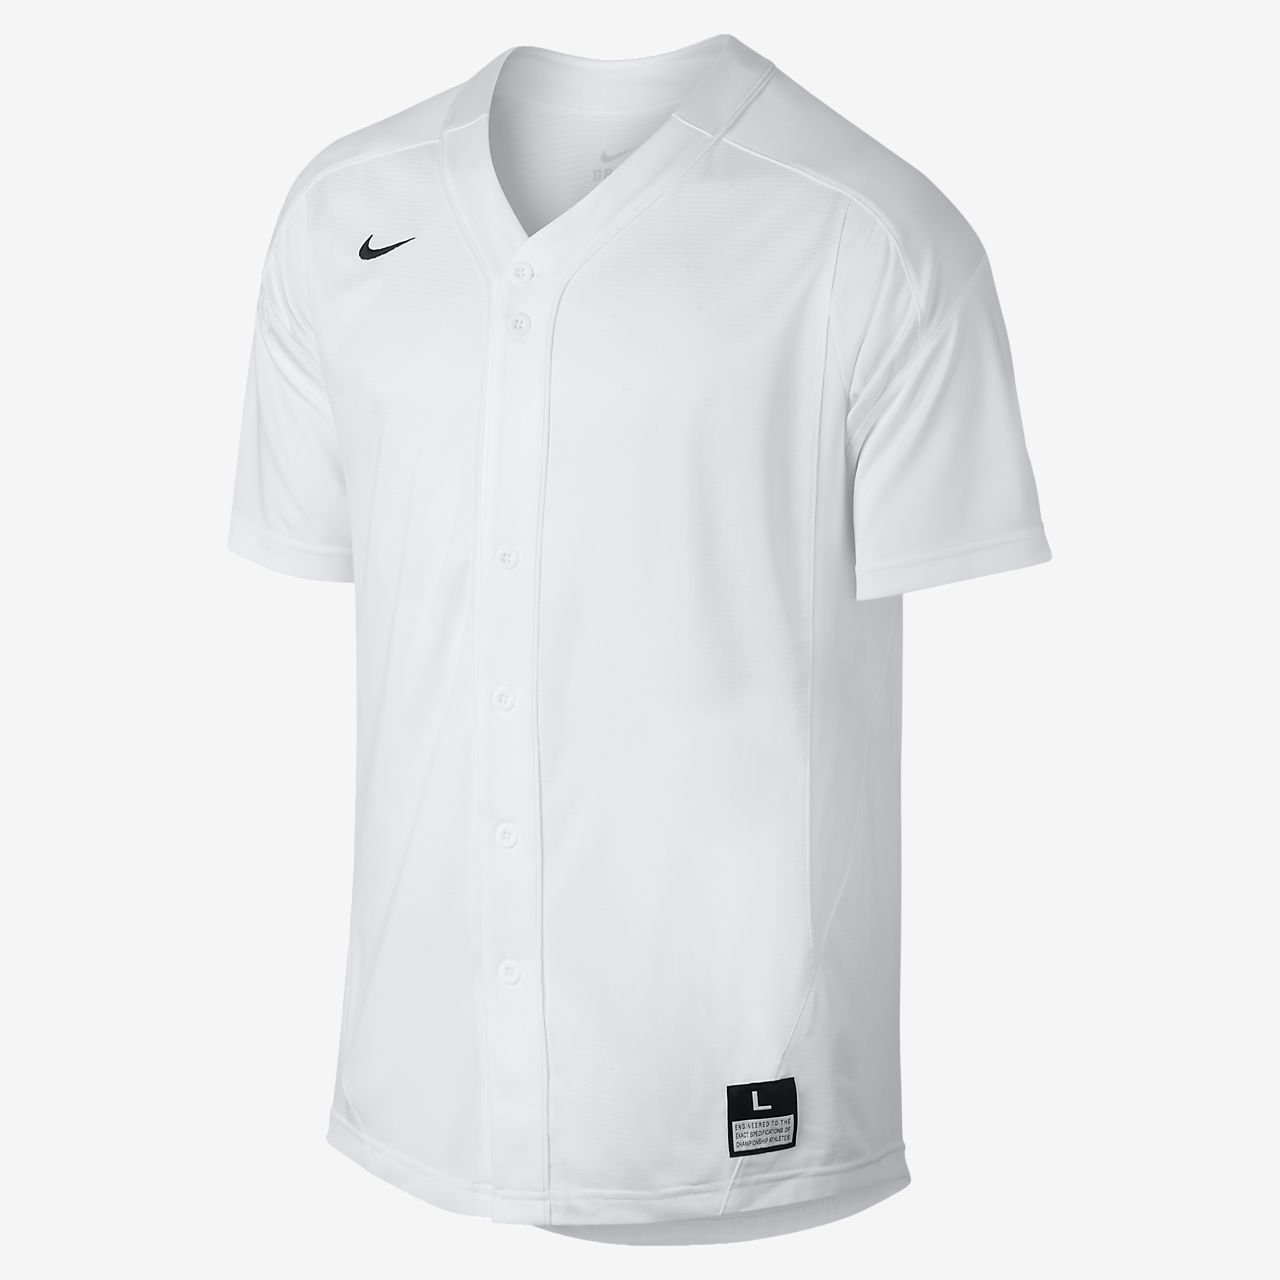 nike vapor shirt